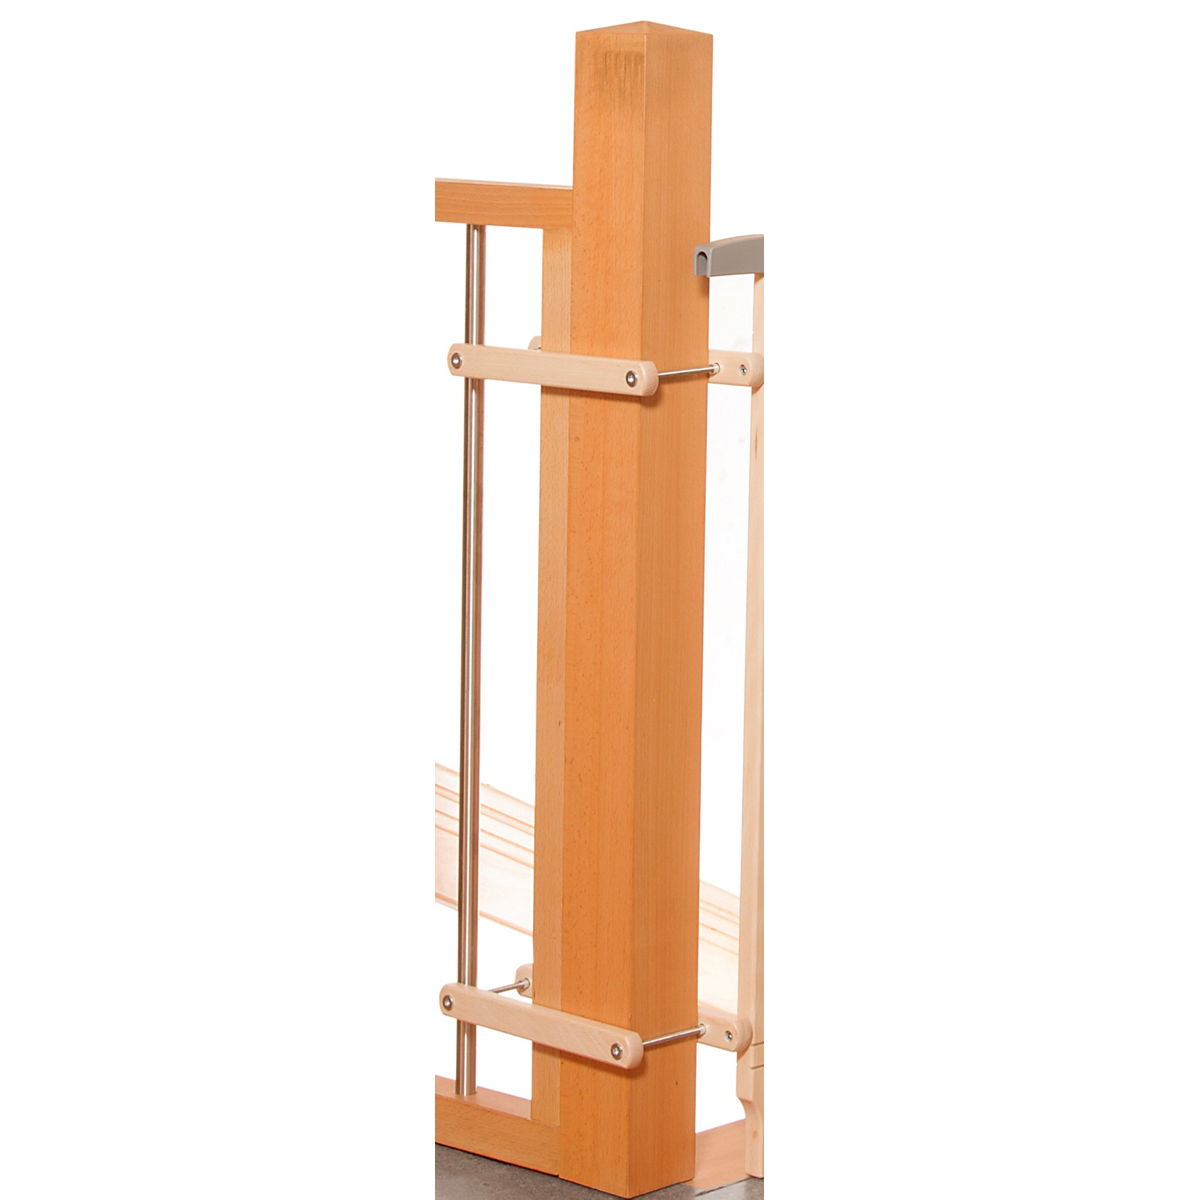 Geuther adaptateur escalier naturel barri re de for Barriere securite escalier helicoidal